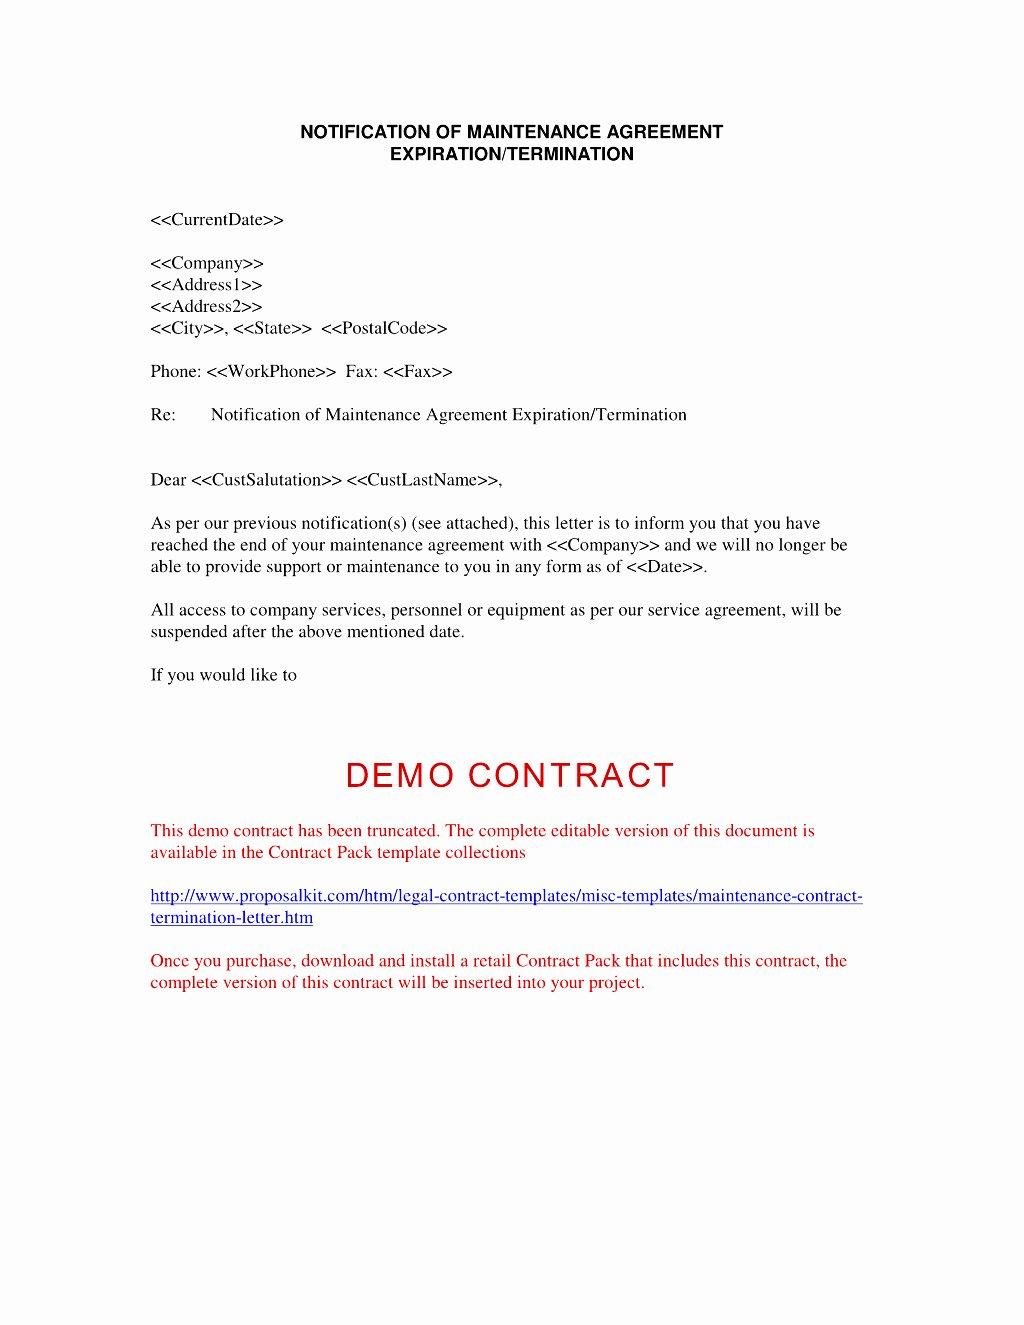 Client Termination Letter Template Beautiful Client Termination Letter Template Collection